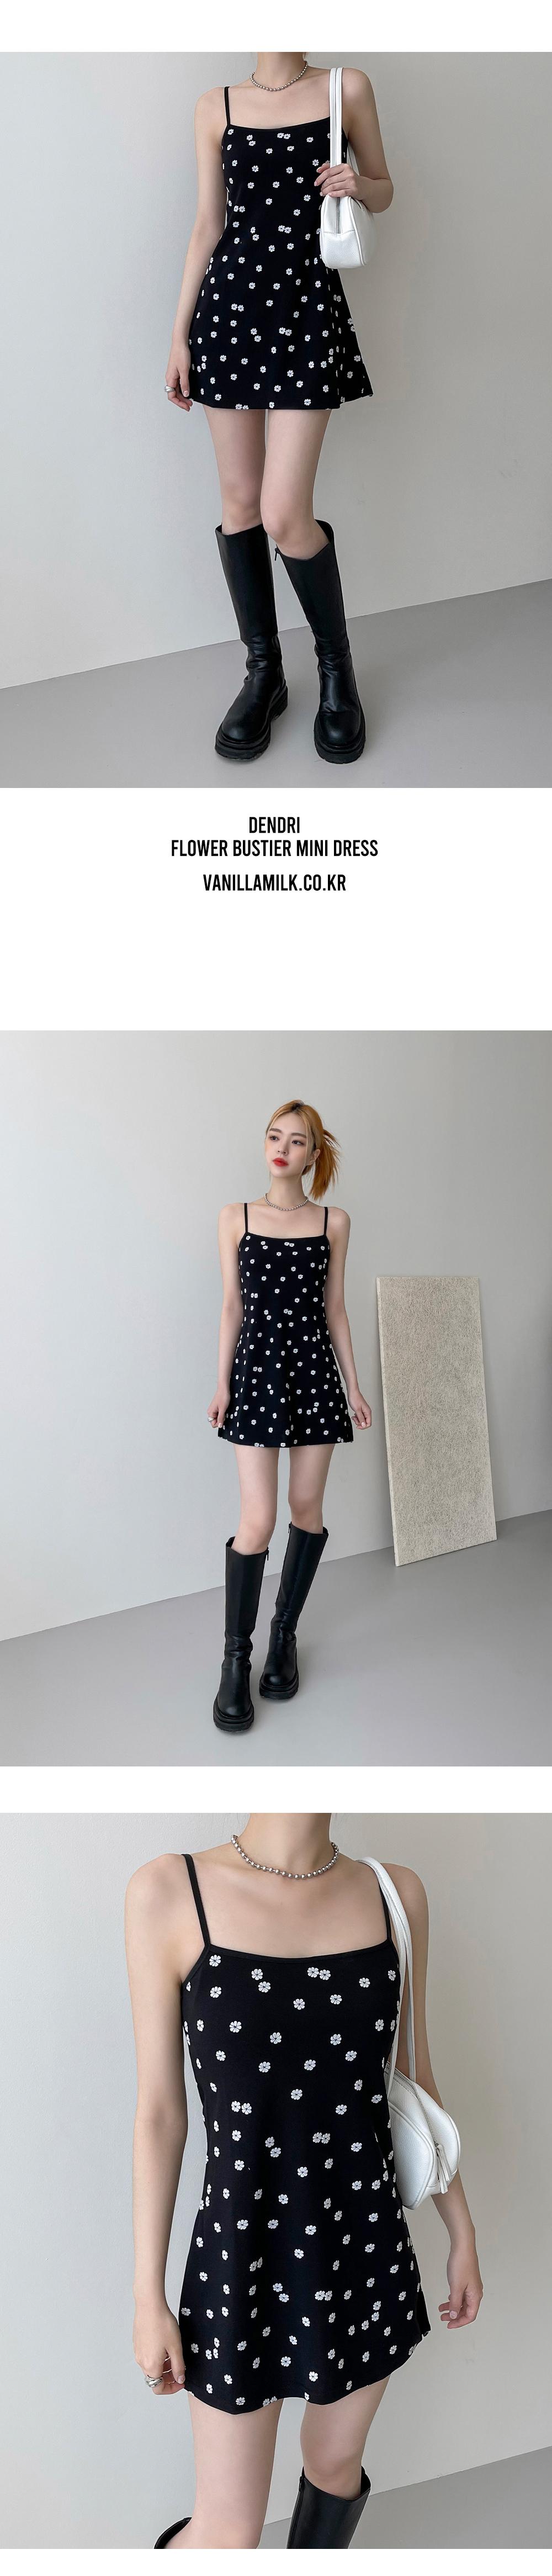 Dendri Flower Bustier Mini Dress